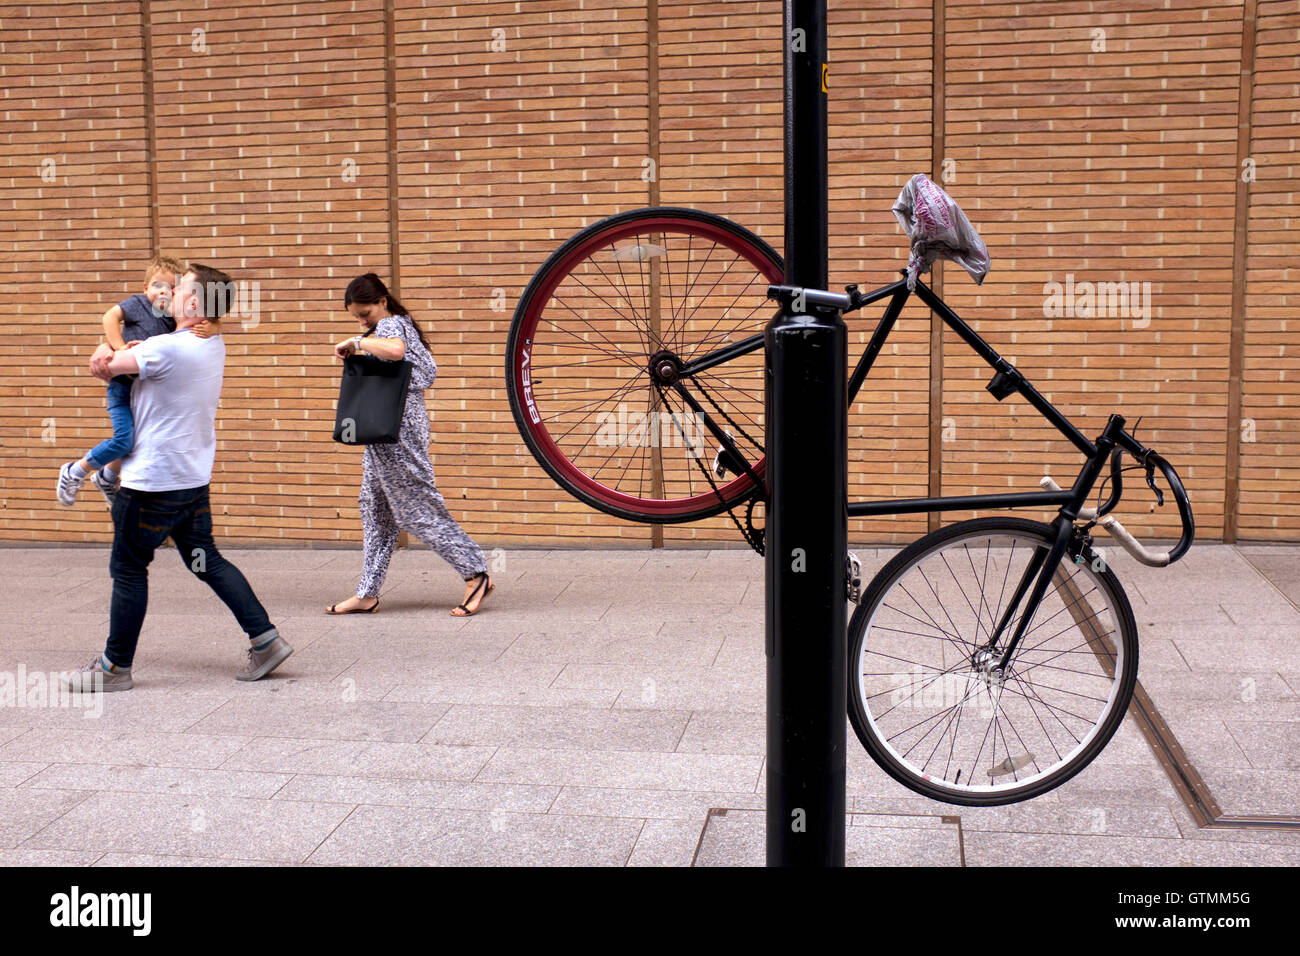 Bike chained to a lamp post, London Bridge, UK, United Kingdom Stock ...